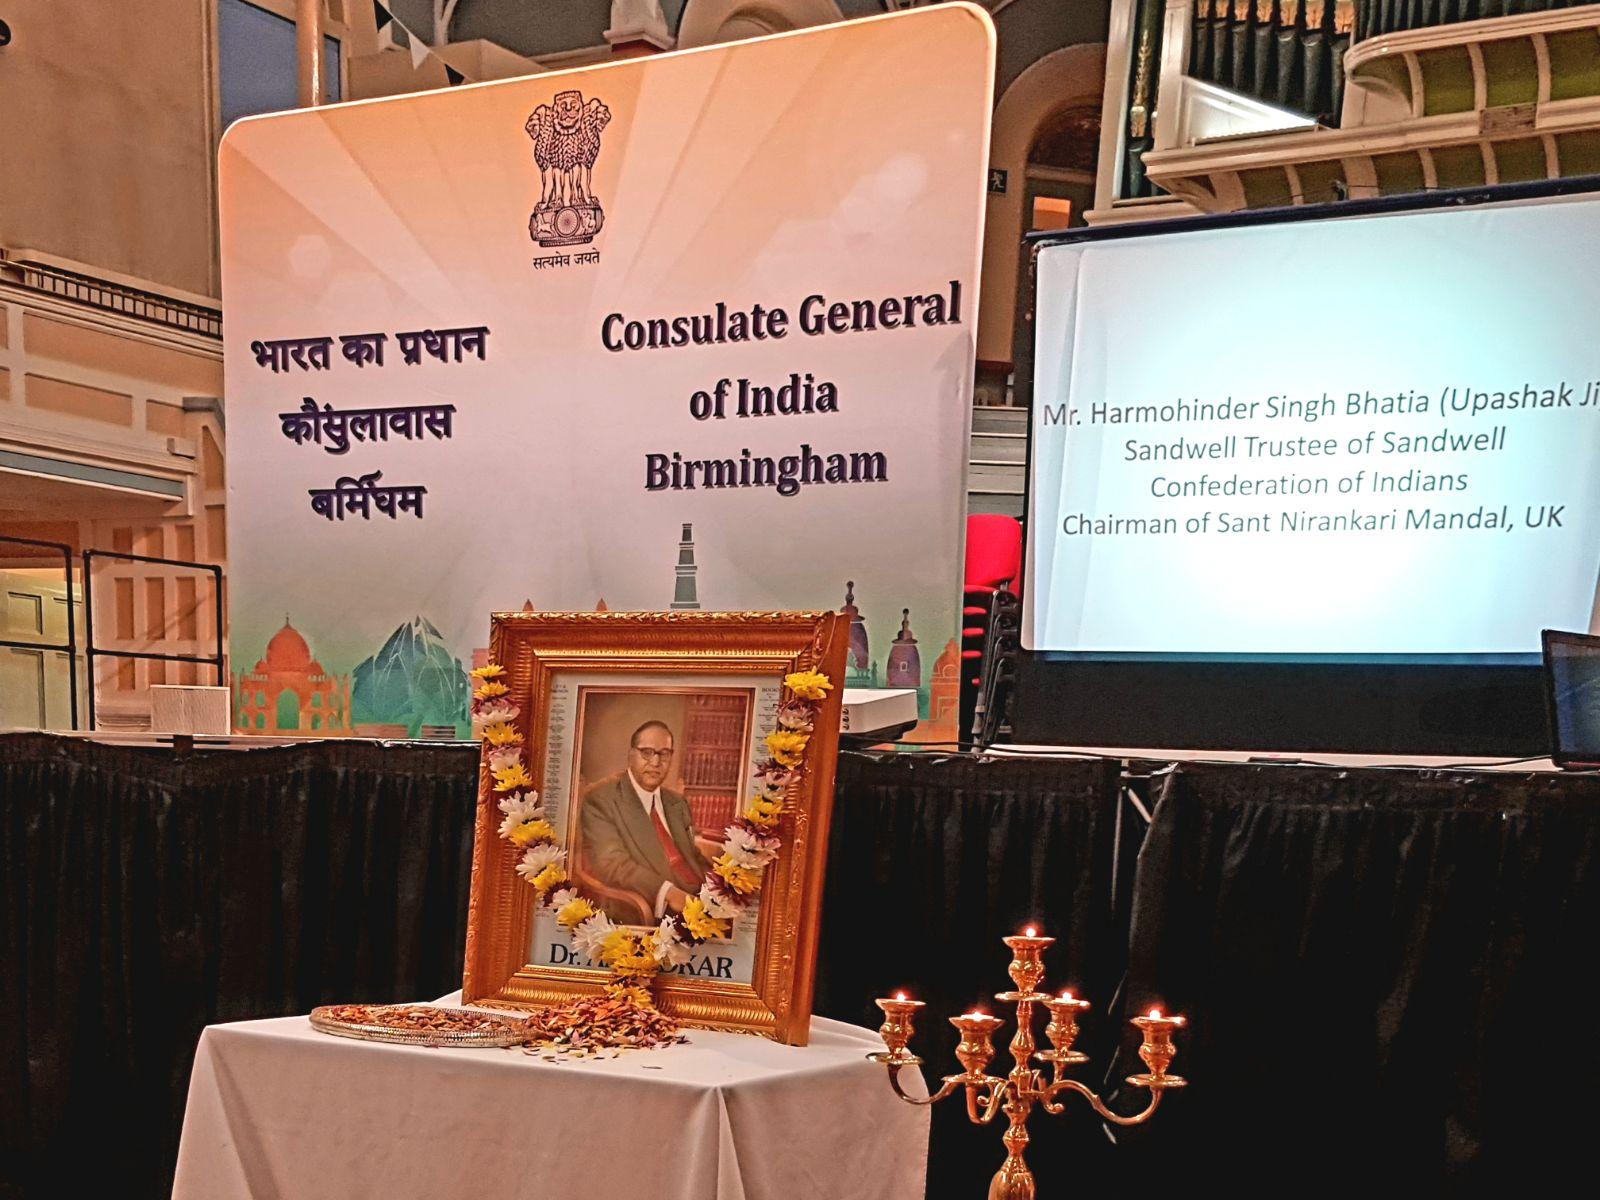 Ambedkar Jayanti celebrations in Birmingham :: Consulate